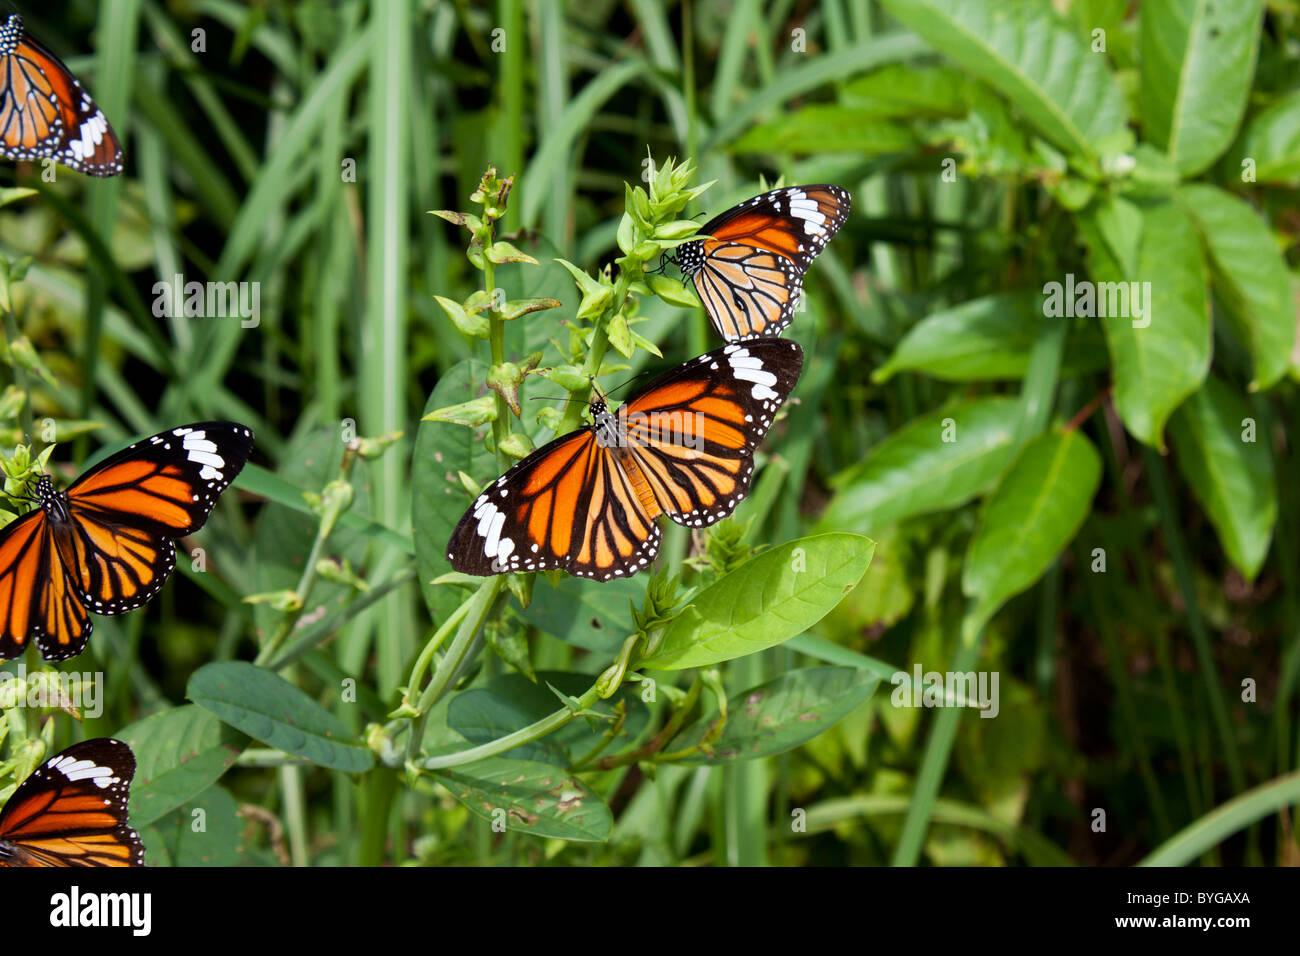 Farfalla monarca (danaus plexippus) seduto su una boccola di Phi Phi, Thailandia Immagini Stock